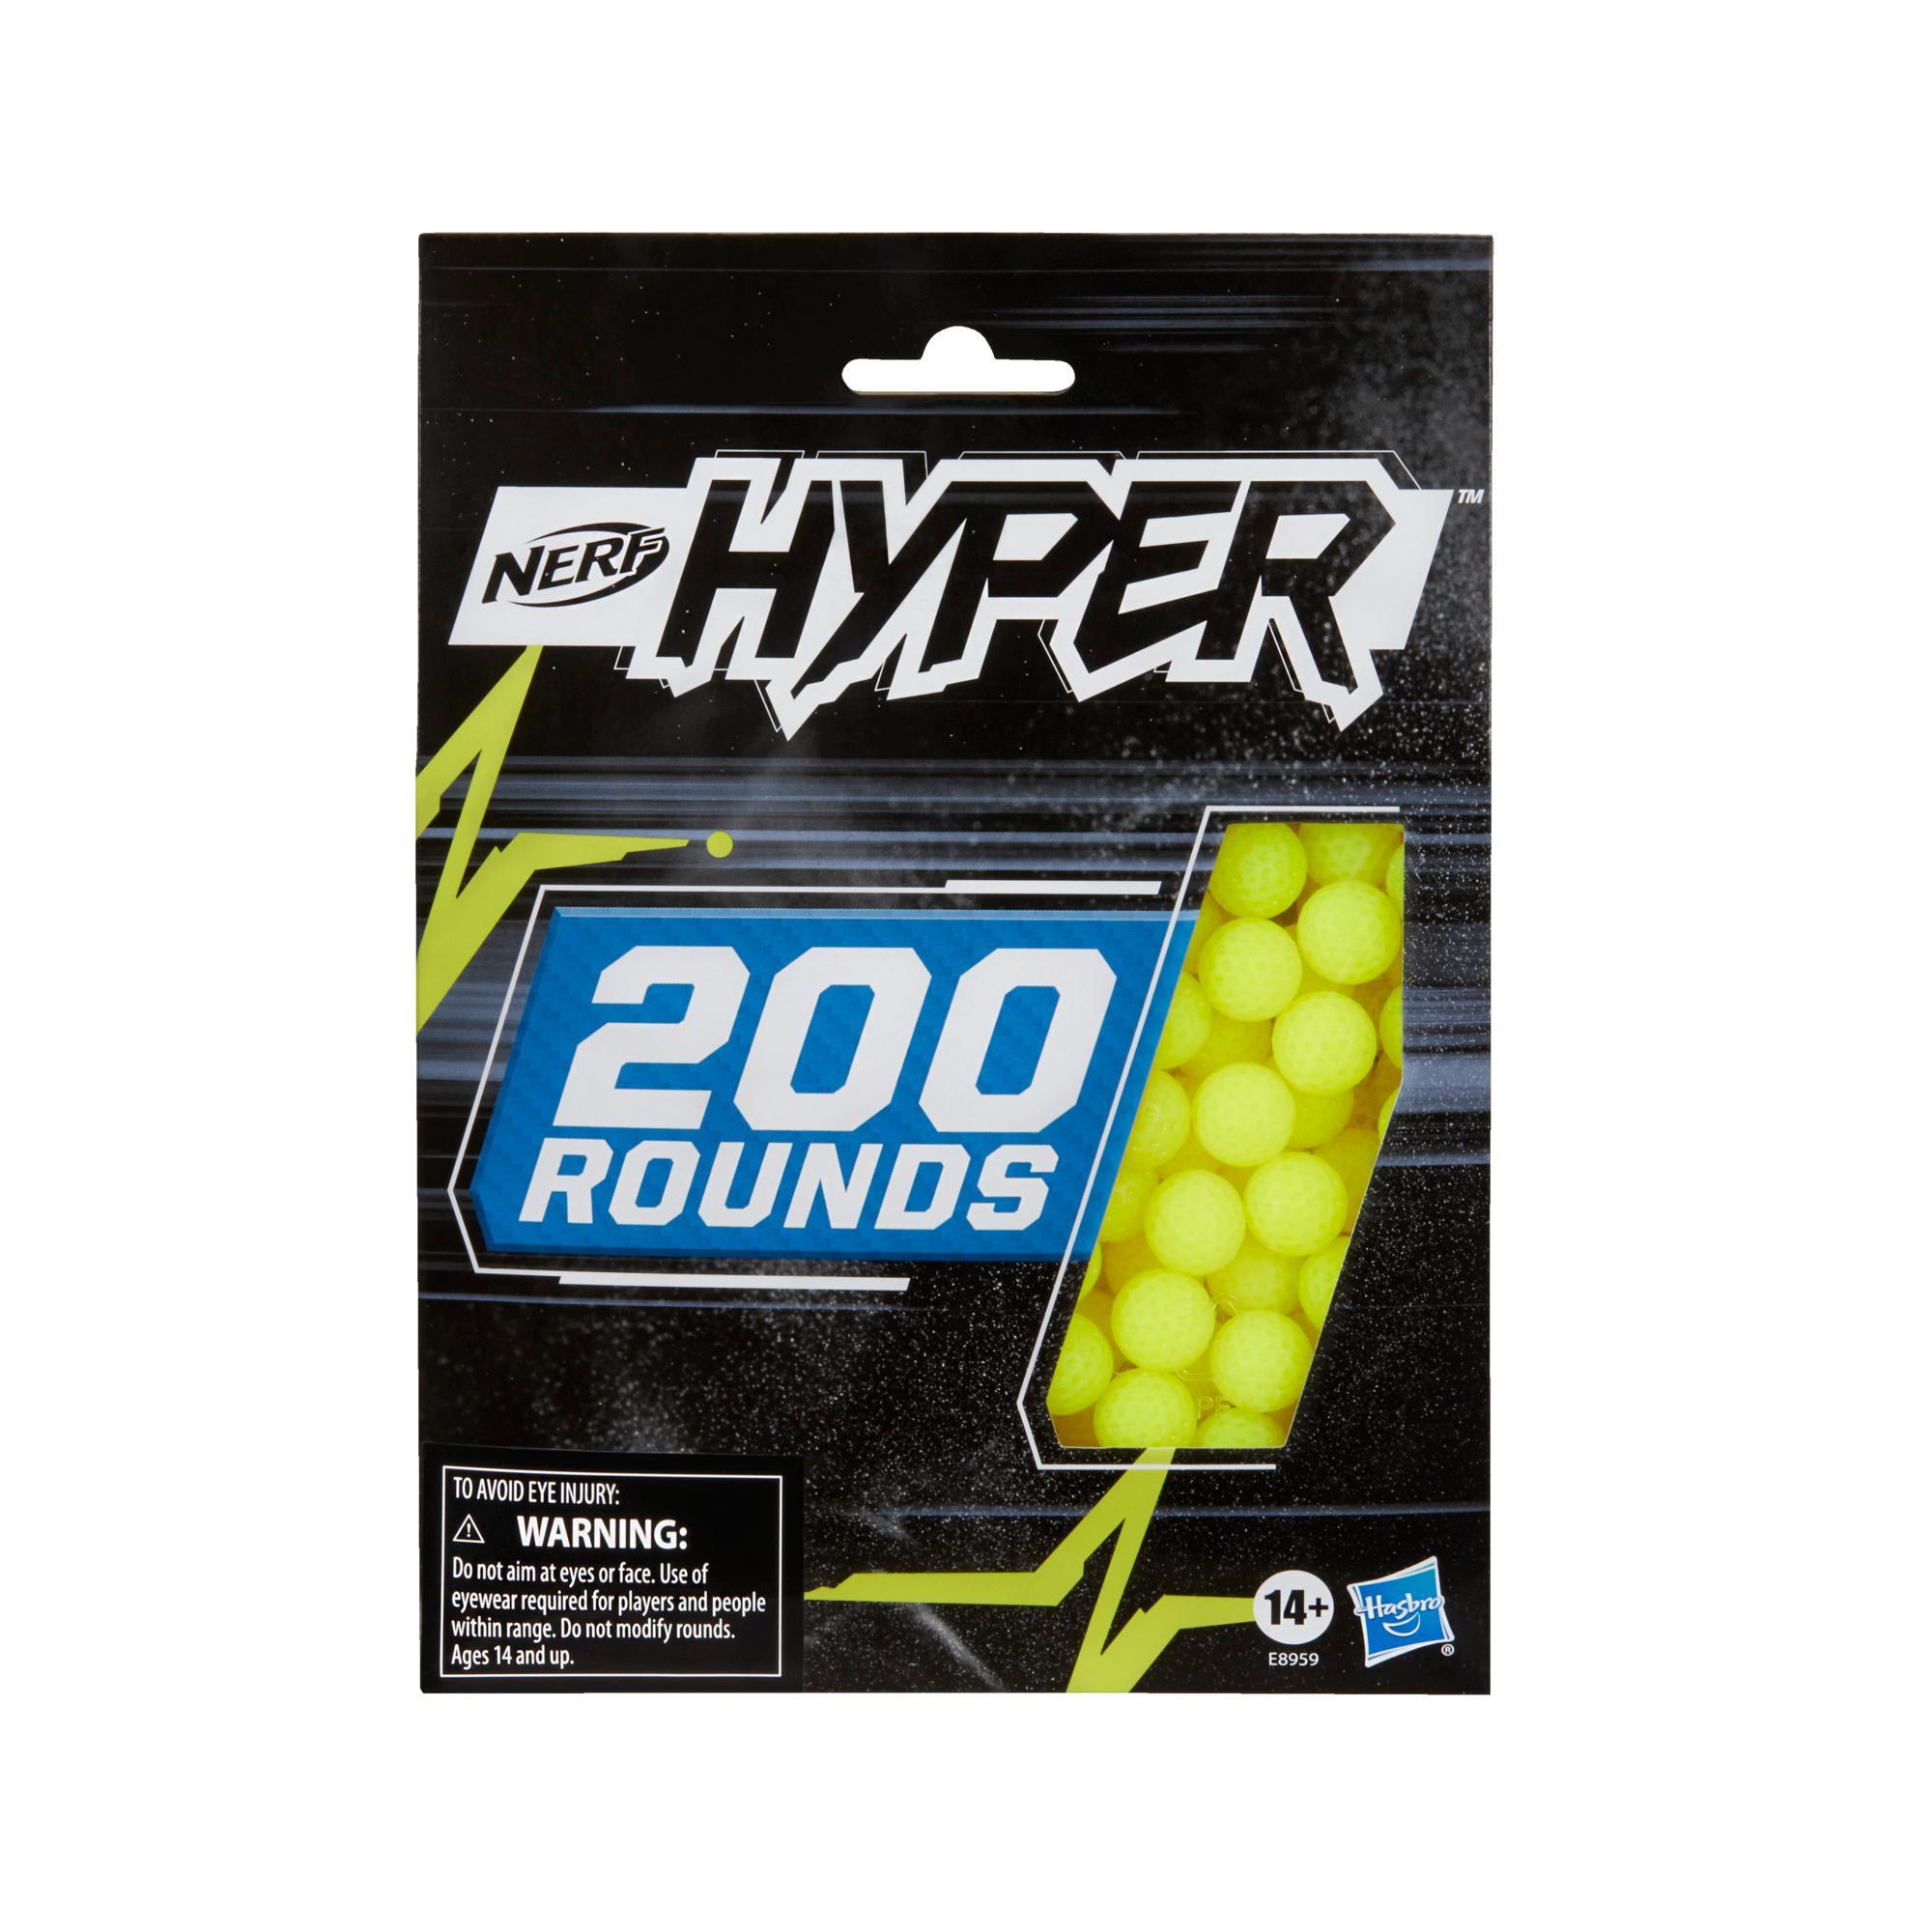 Nerf Hyper, recharge de 200 billes en mousse Nerf Hyper officielles, à utiliser avec les blaster Nerf Hyper